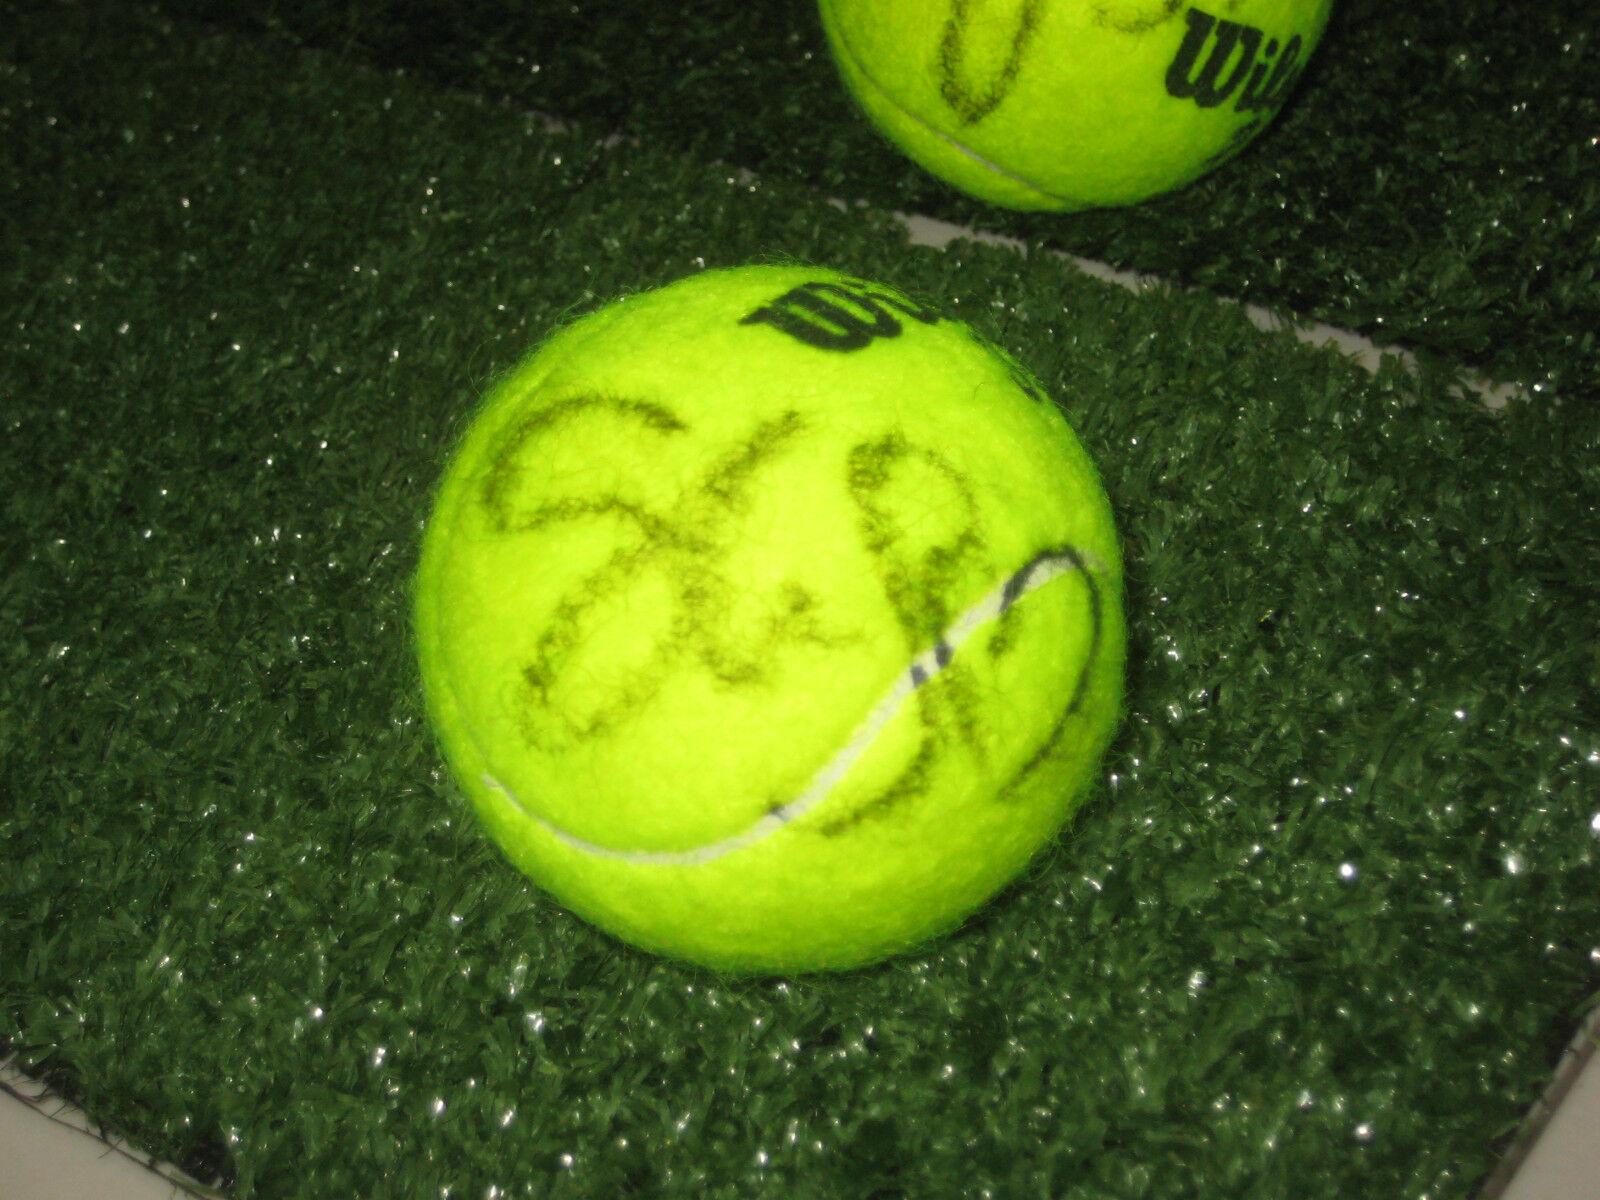 SLOANE STEPHENS HAND SIGNED TENNIS BALL UNFRAMED + PHOTO PROOF + C.O.A